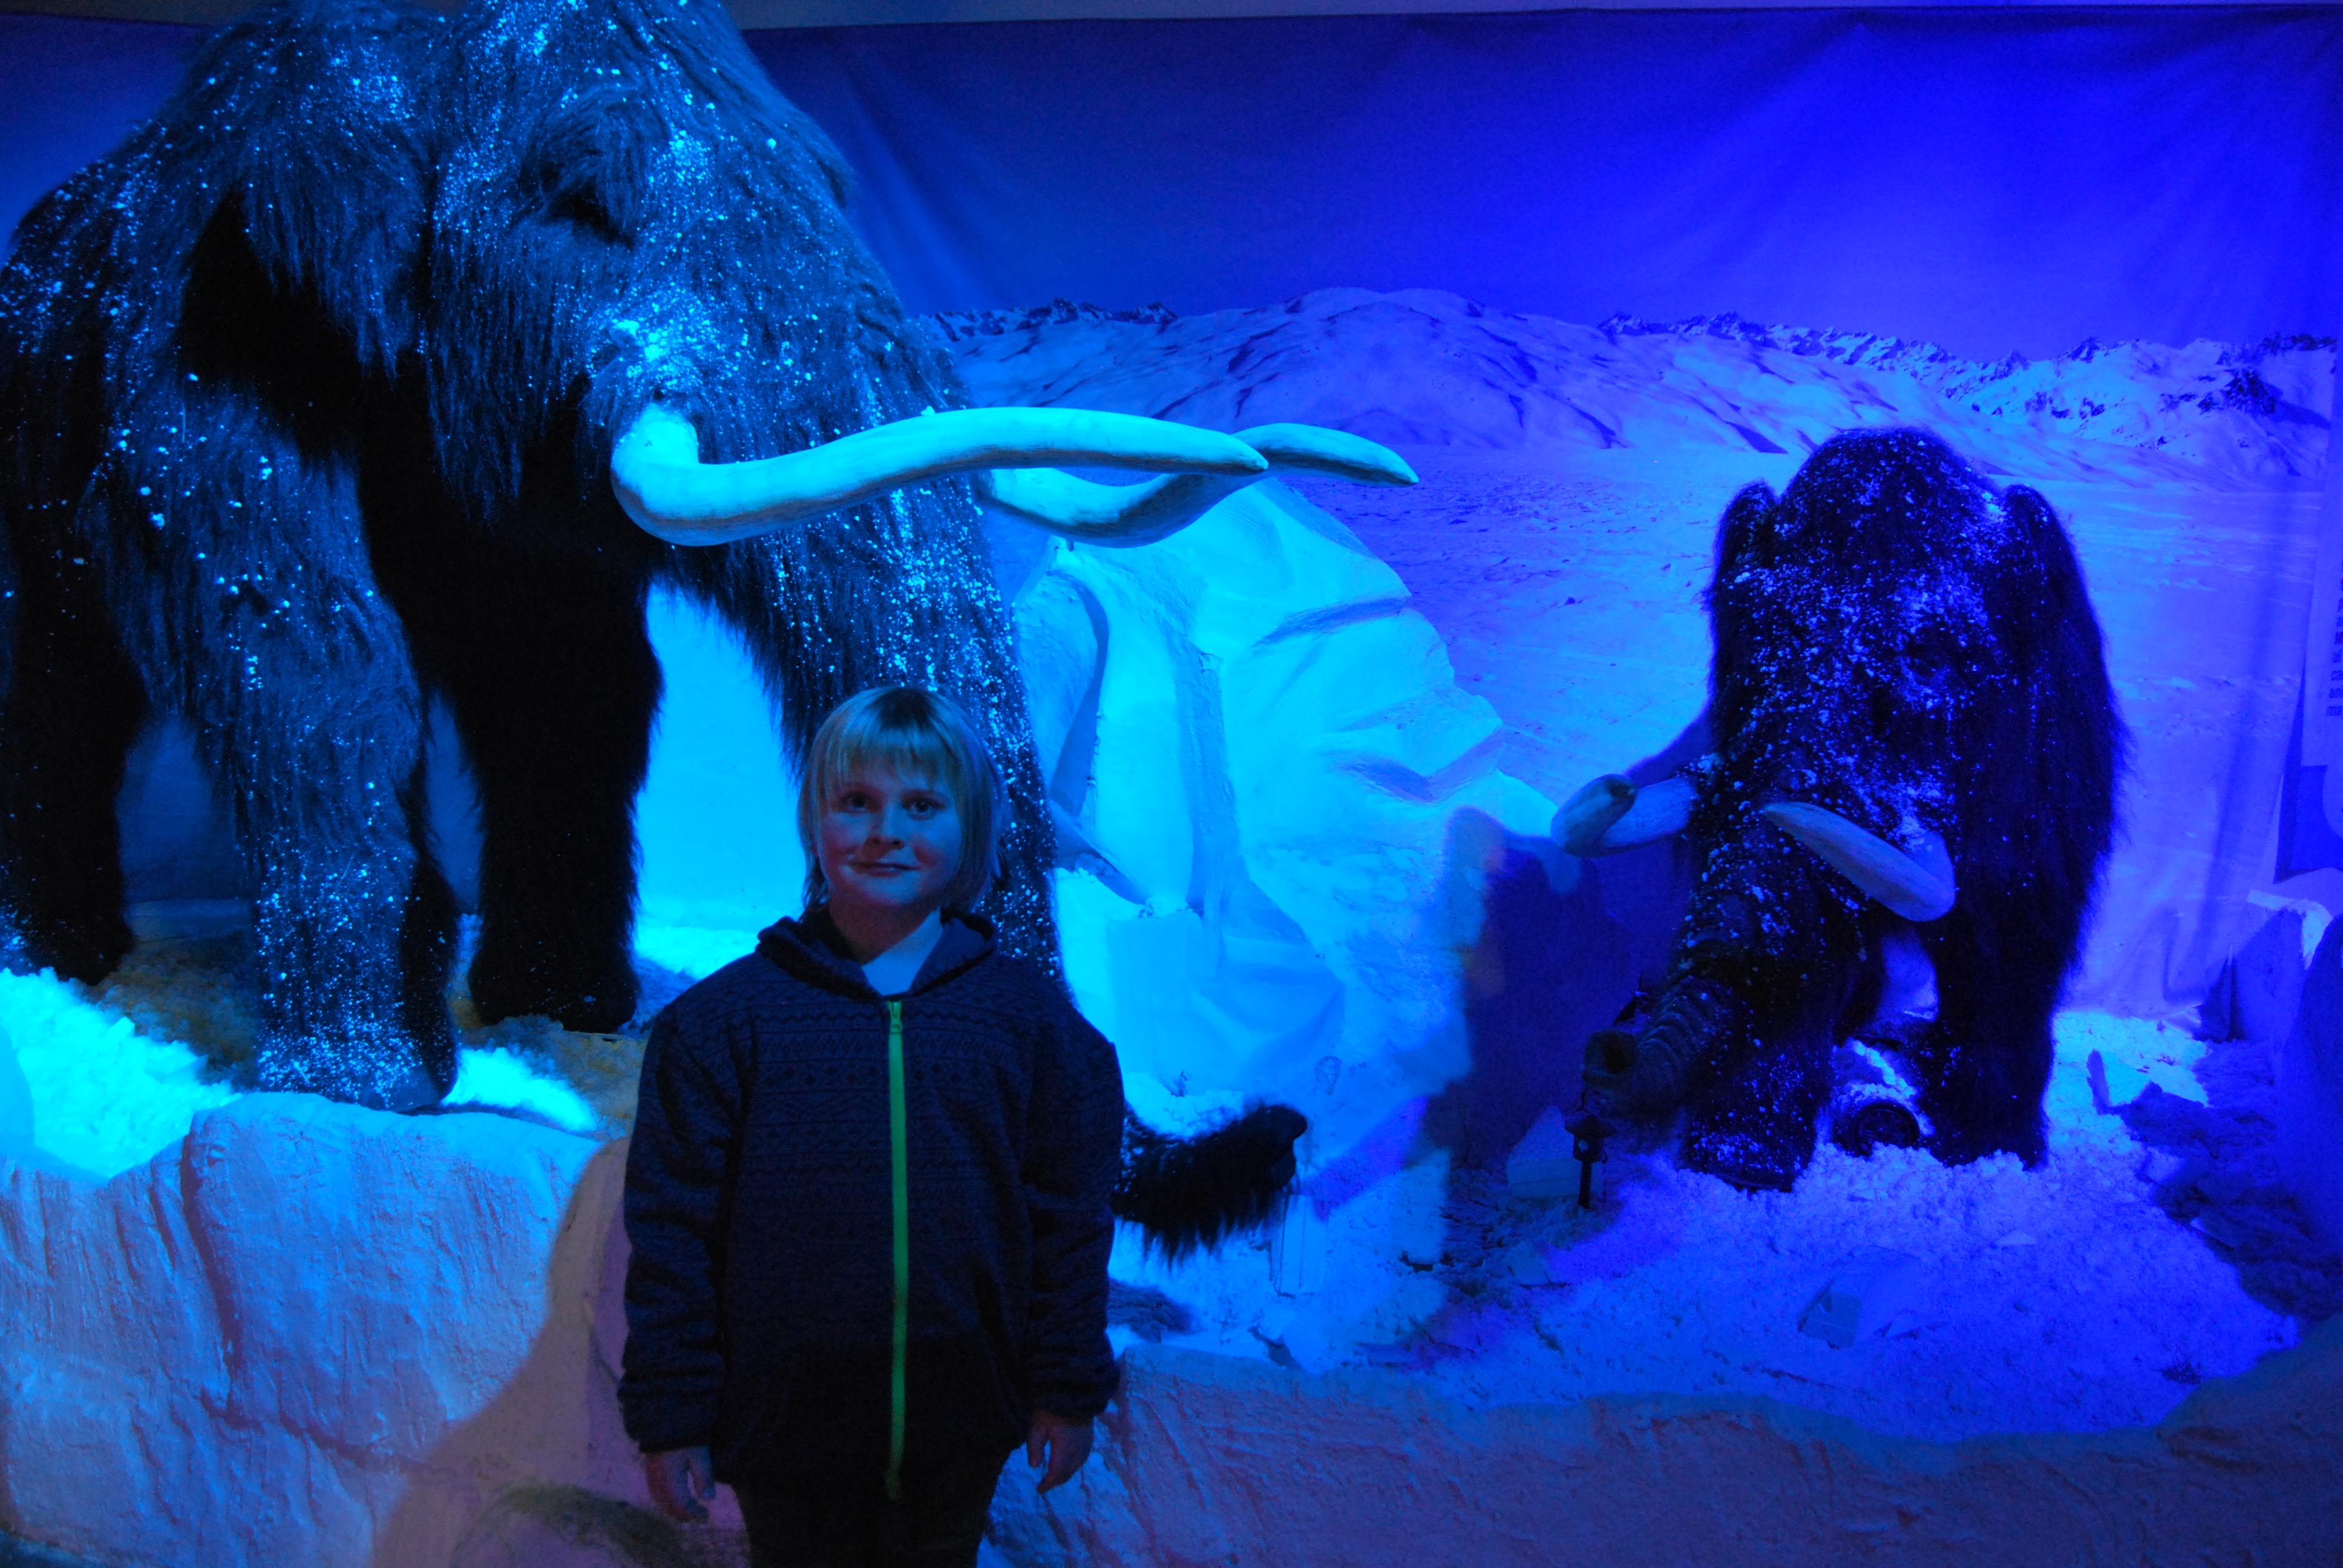 we had so much fun at Snow World!